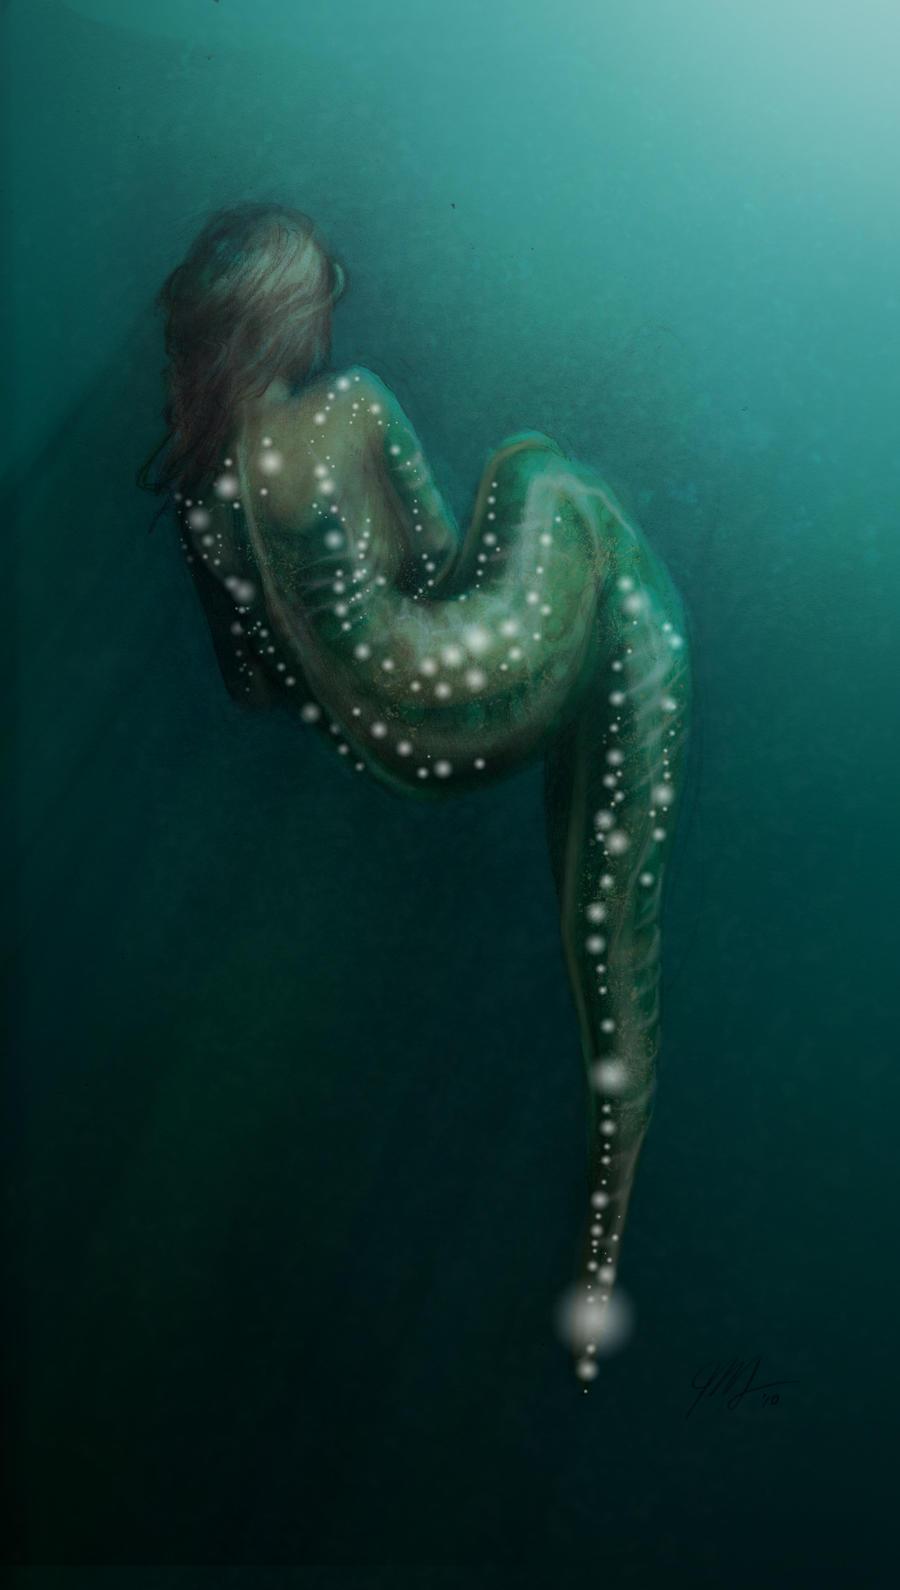 Eel in the Dark by key-0